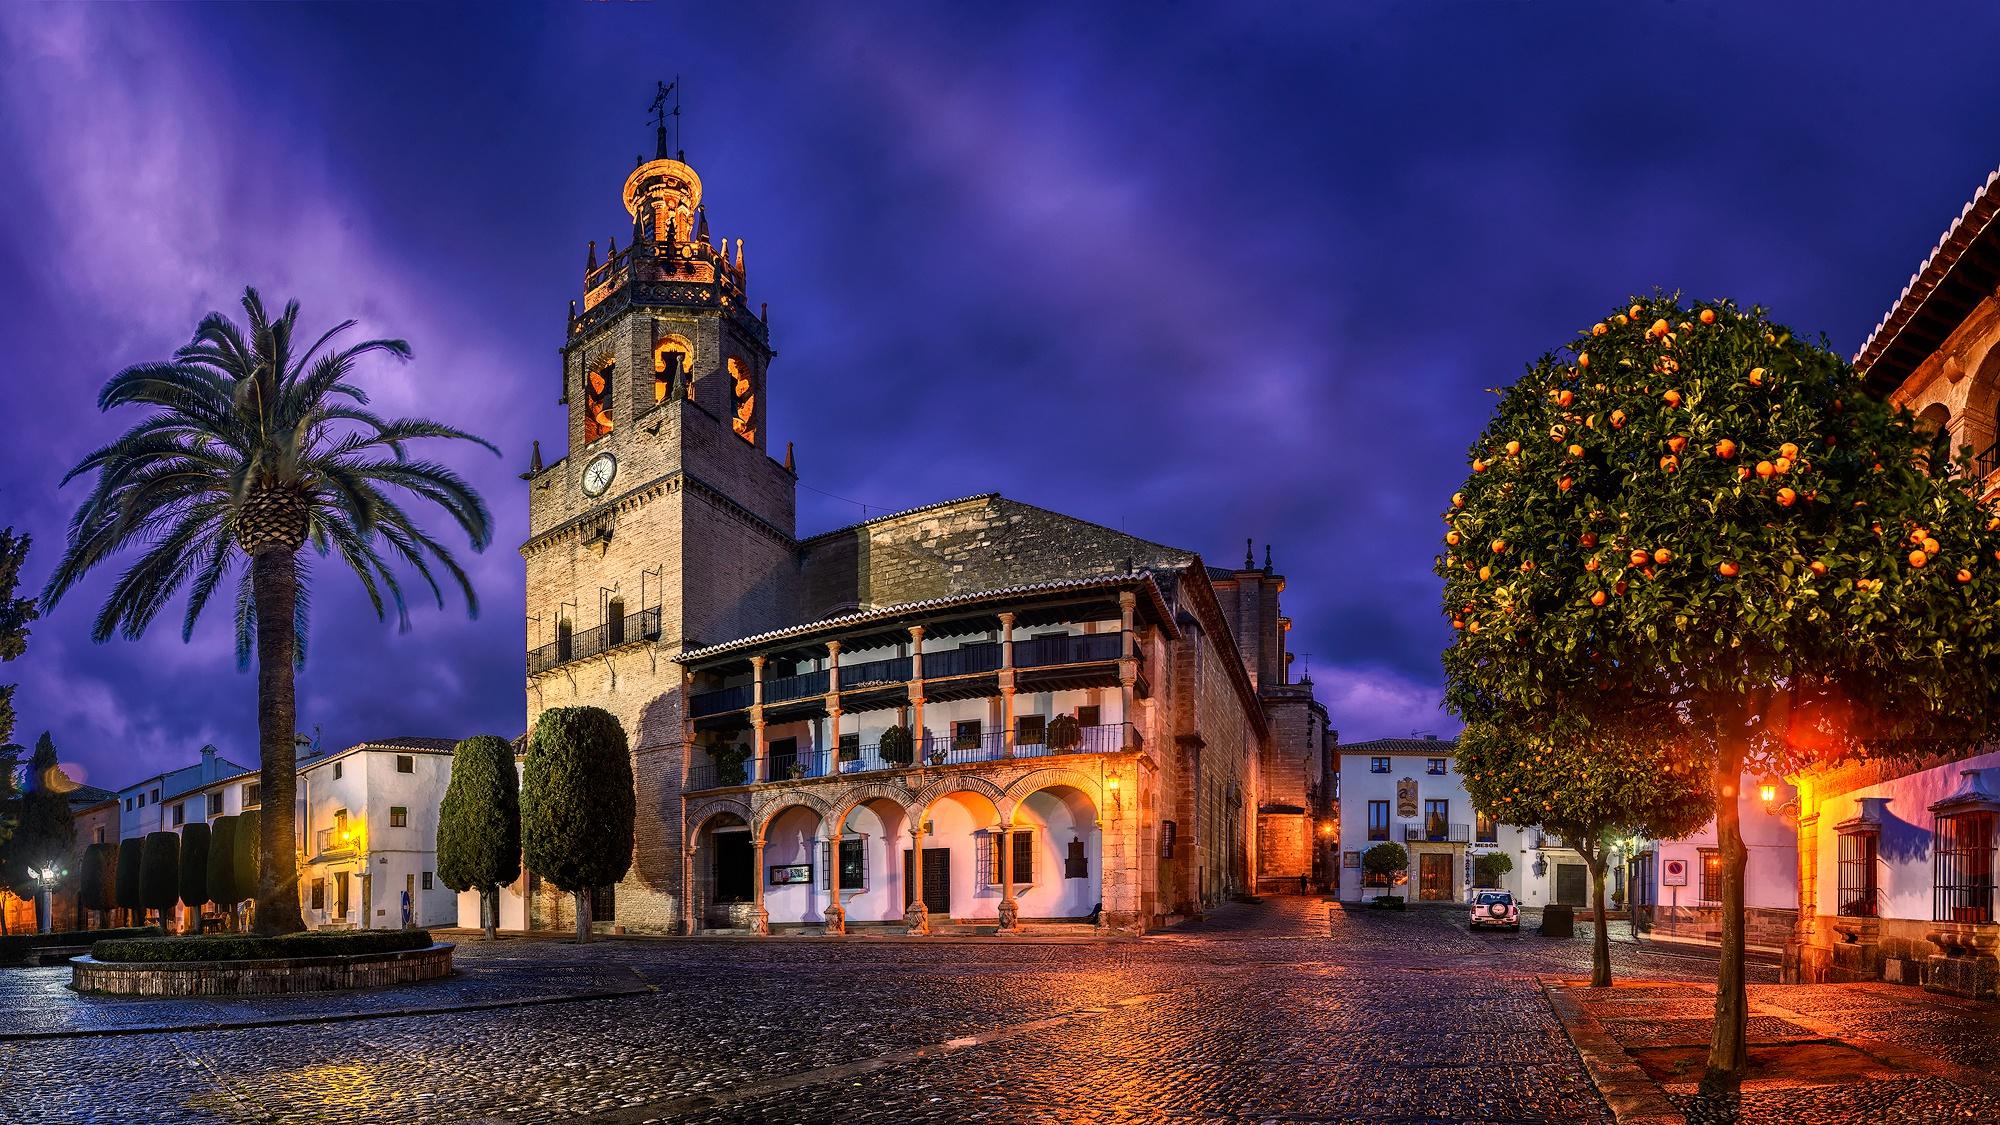 архитектура страны Испания бесплатно